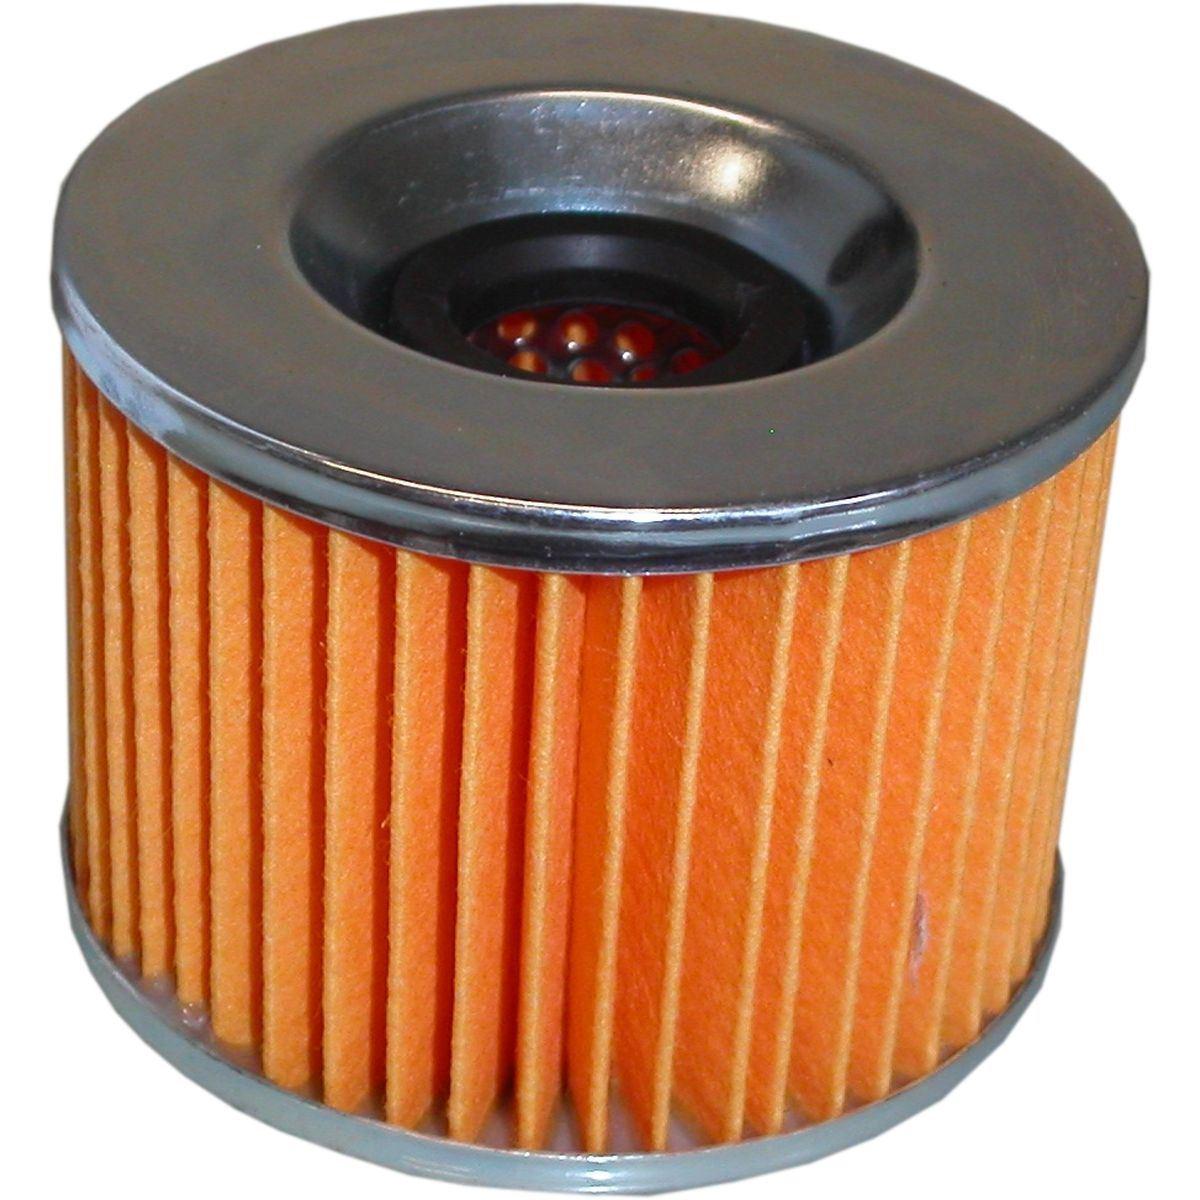 Oil Filter for 2000 Triumph Thunderbird 900 (885cc) (Carb)